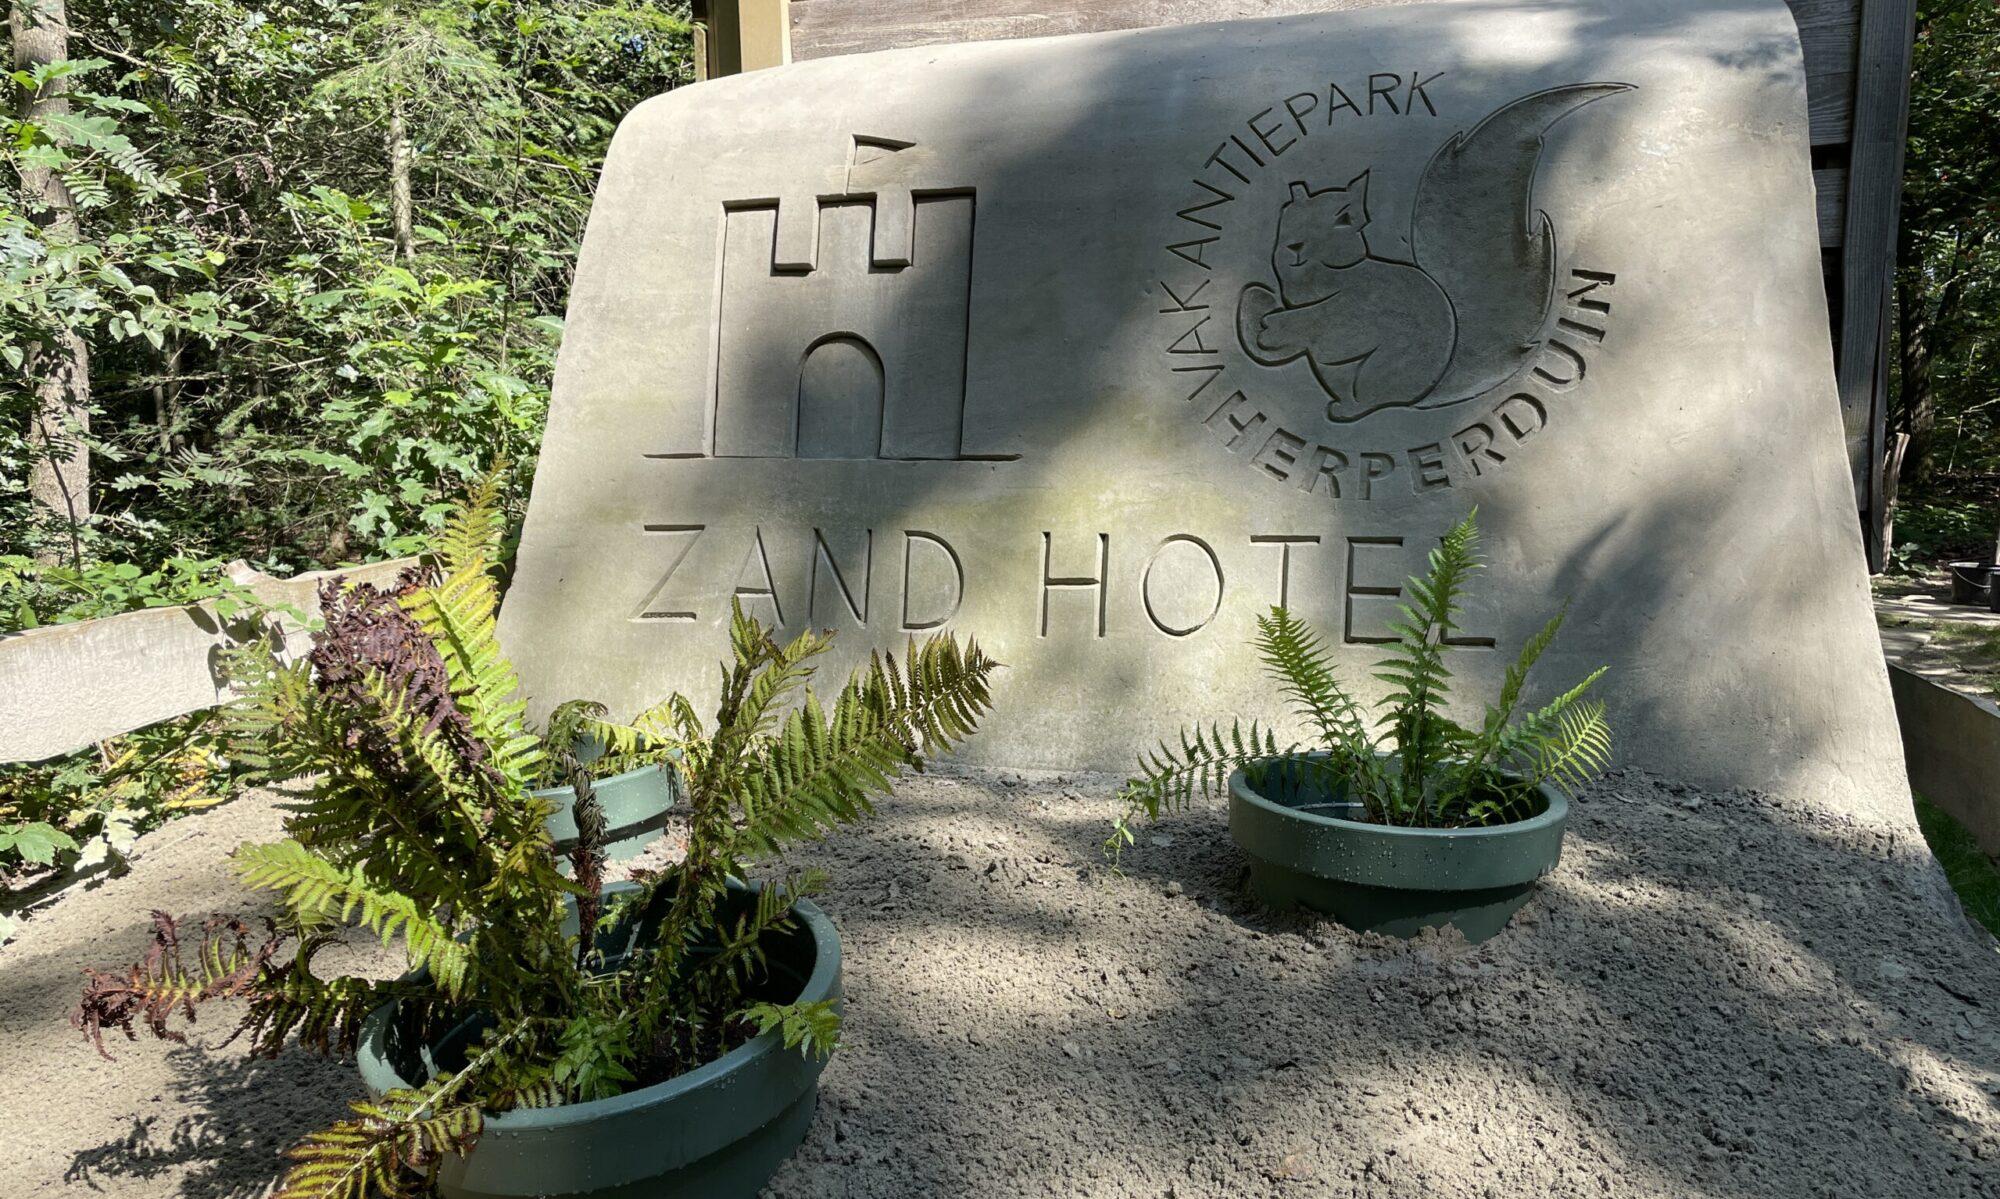 Zandhotel.nl